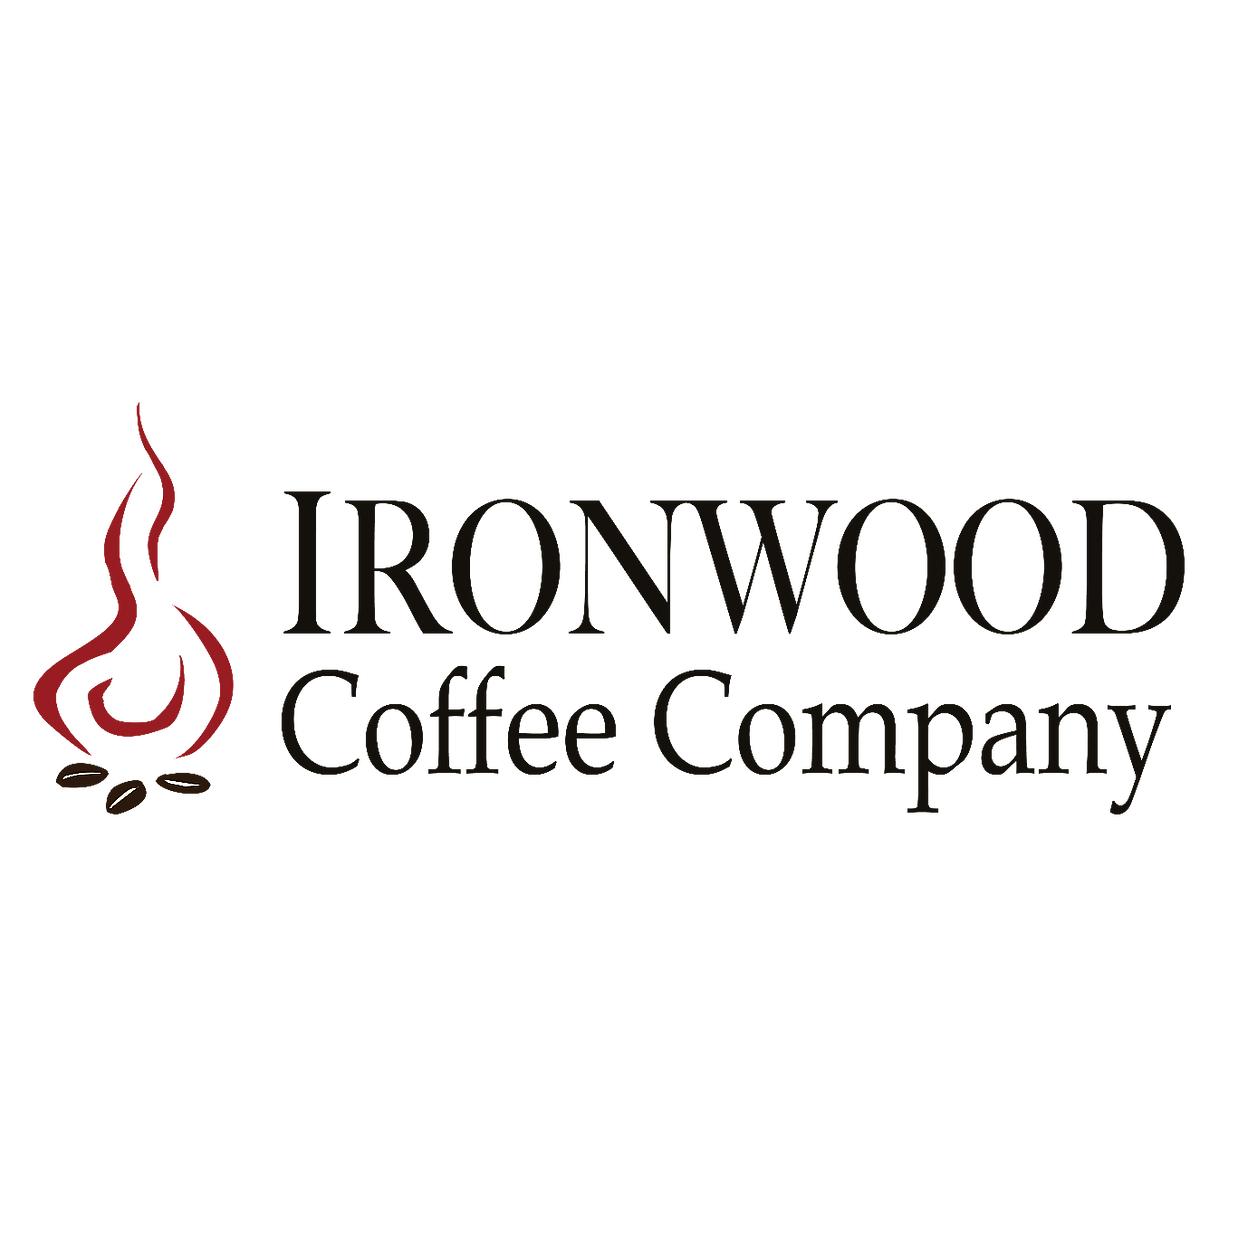 Ironwood Coffee